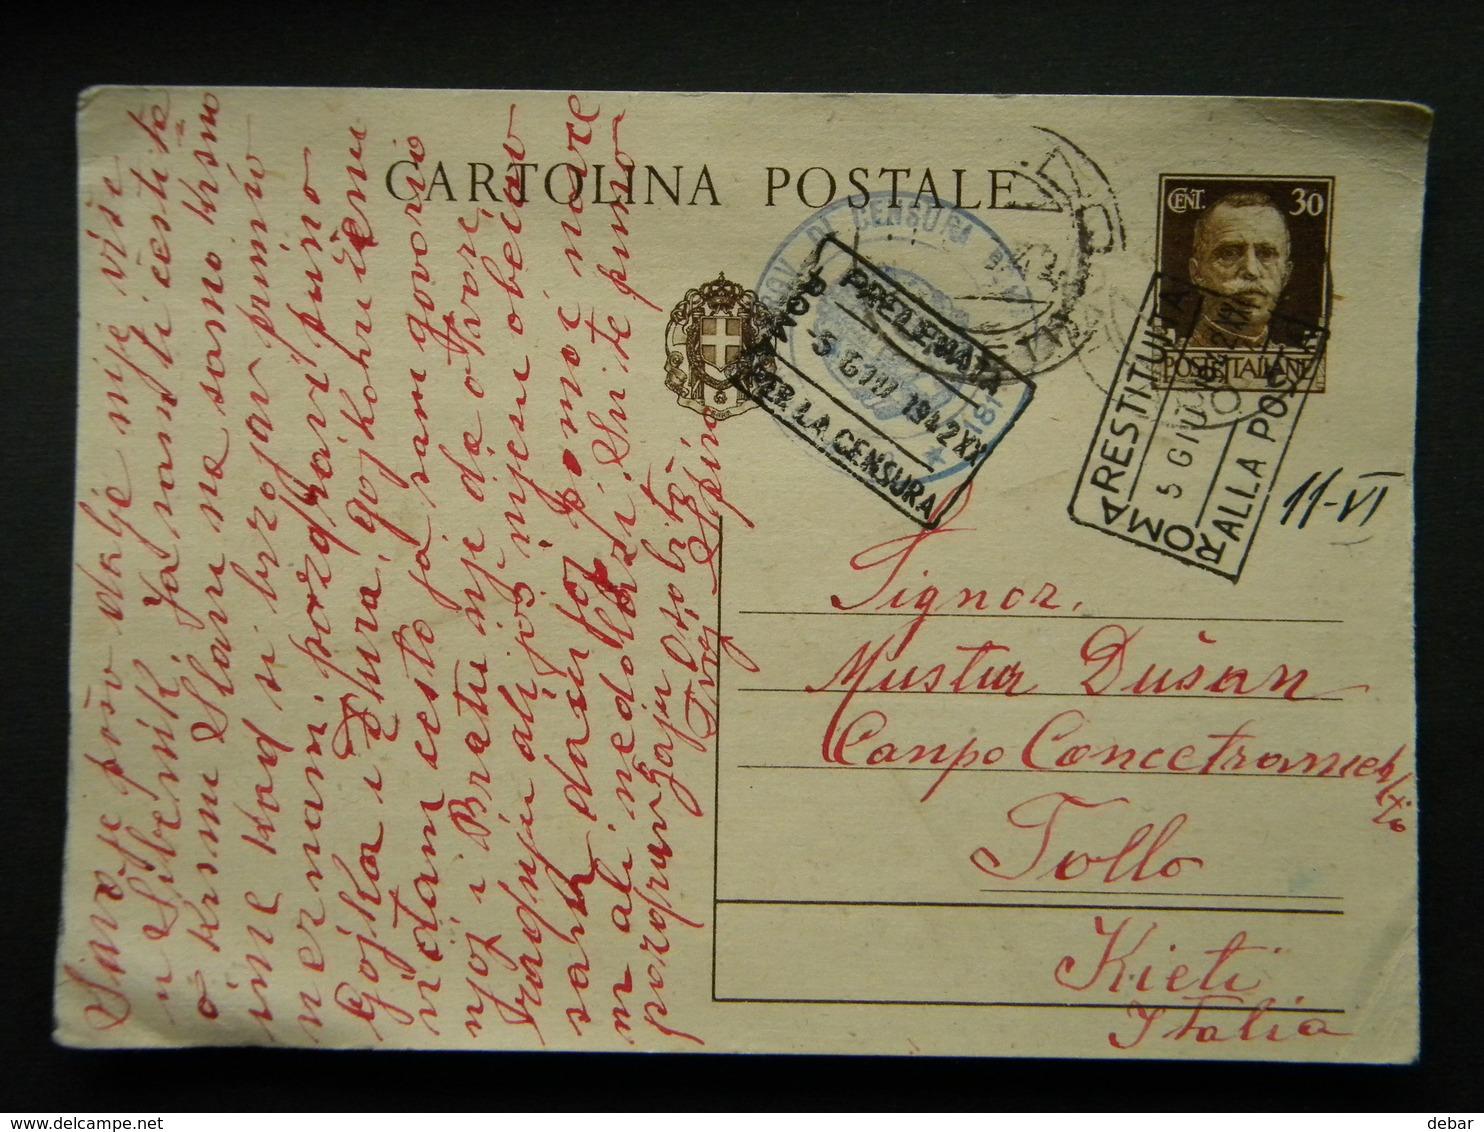 WW2 - ITALY OCCUPATION OF MONTENEGRO 1942 - PERASTO  TO TOLLO  KIETI - CENSURA ROMA - RESTITUTA  ALLA POSTA  ROMA - 9. Besetzung 2. WK (Italien)